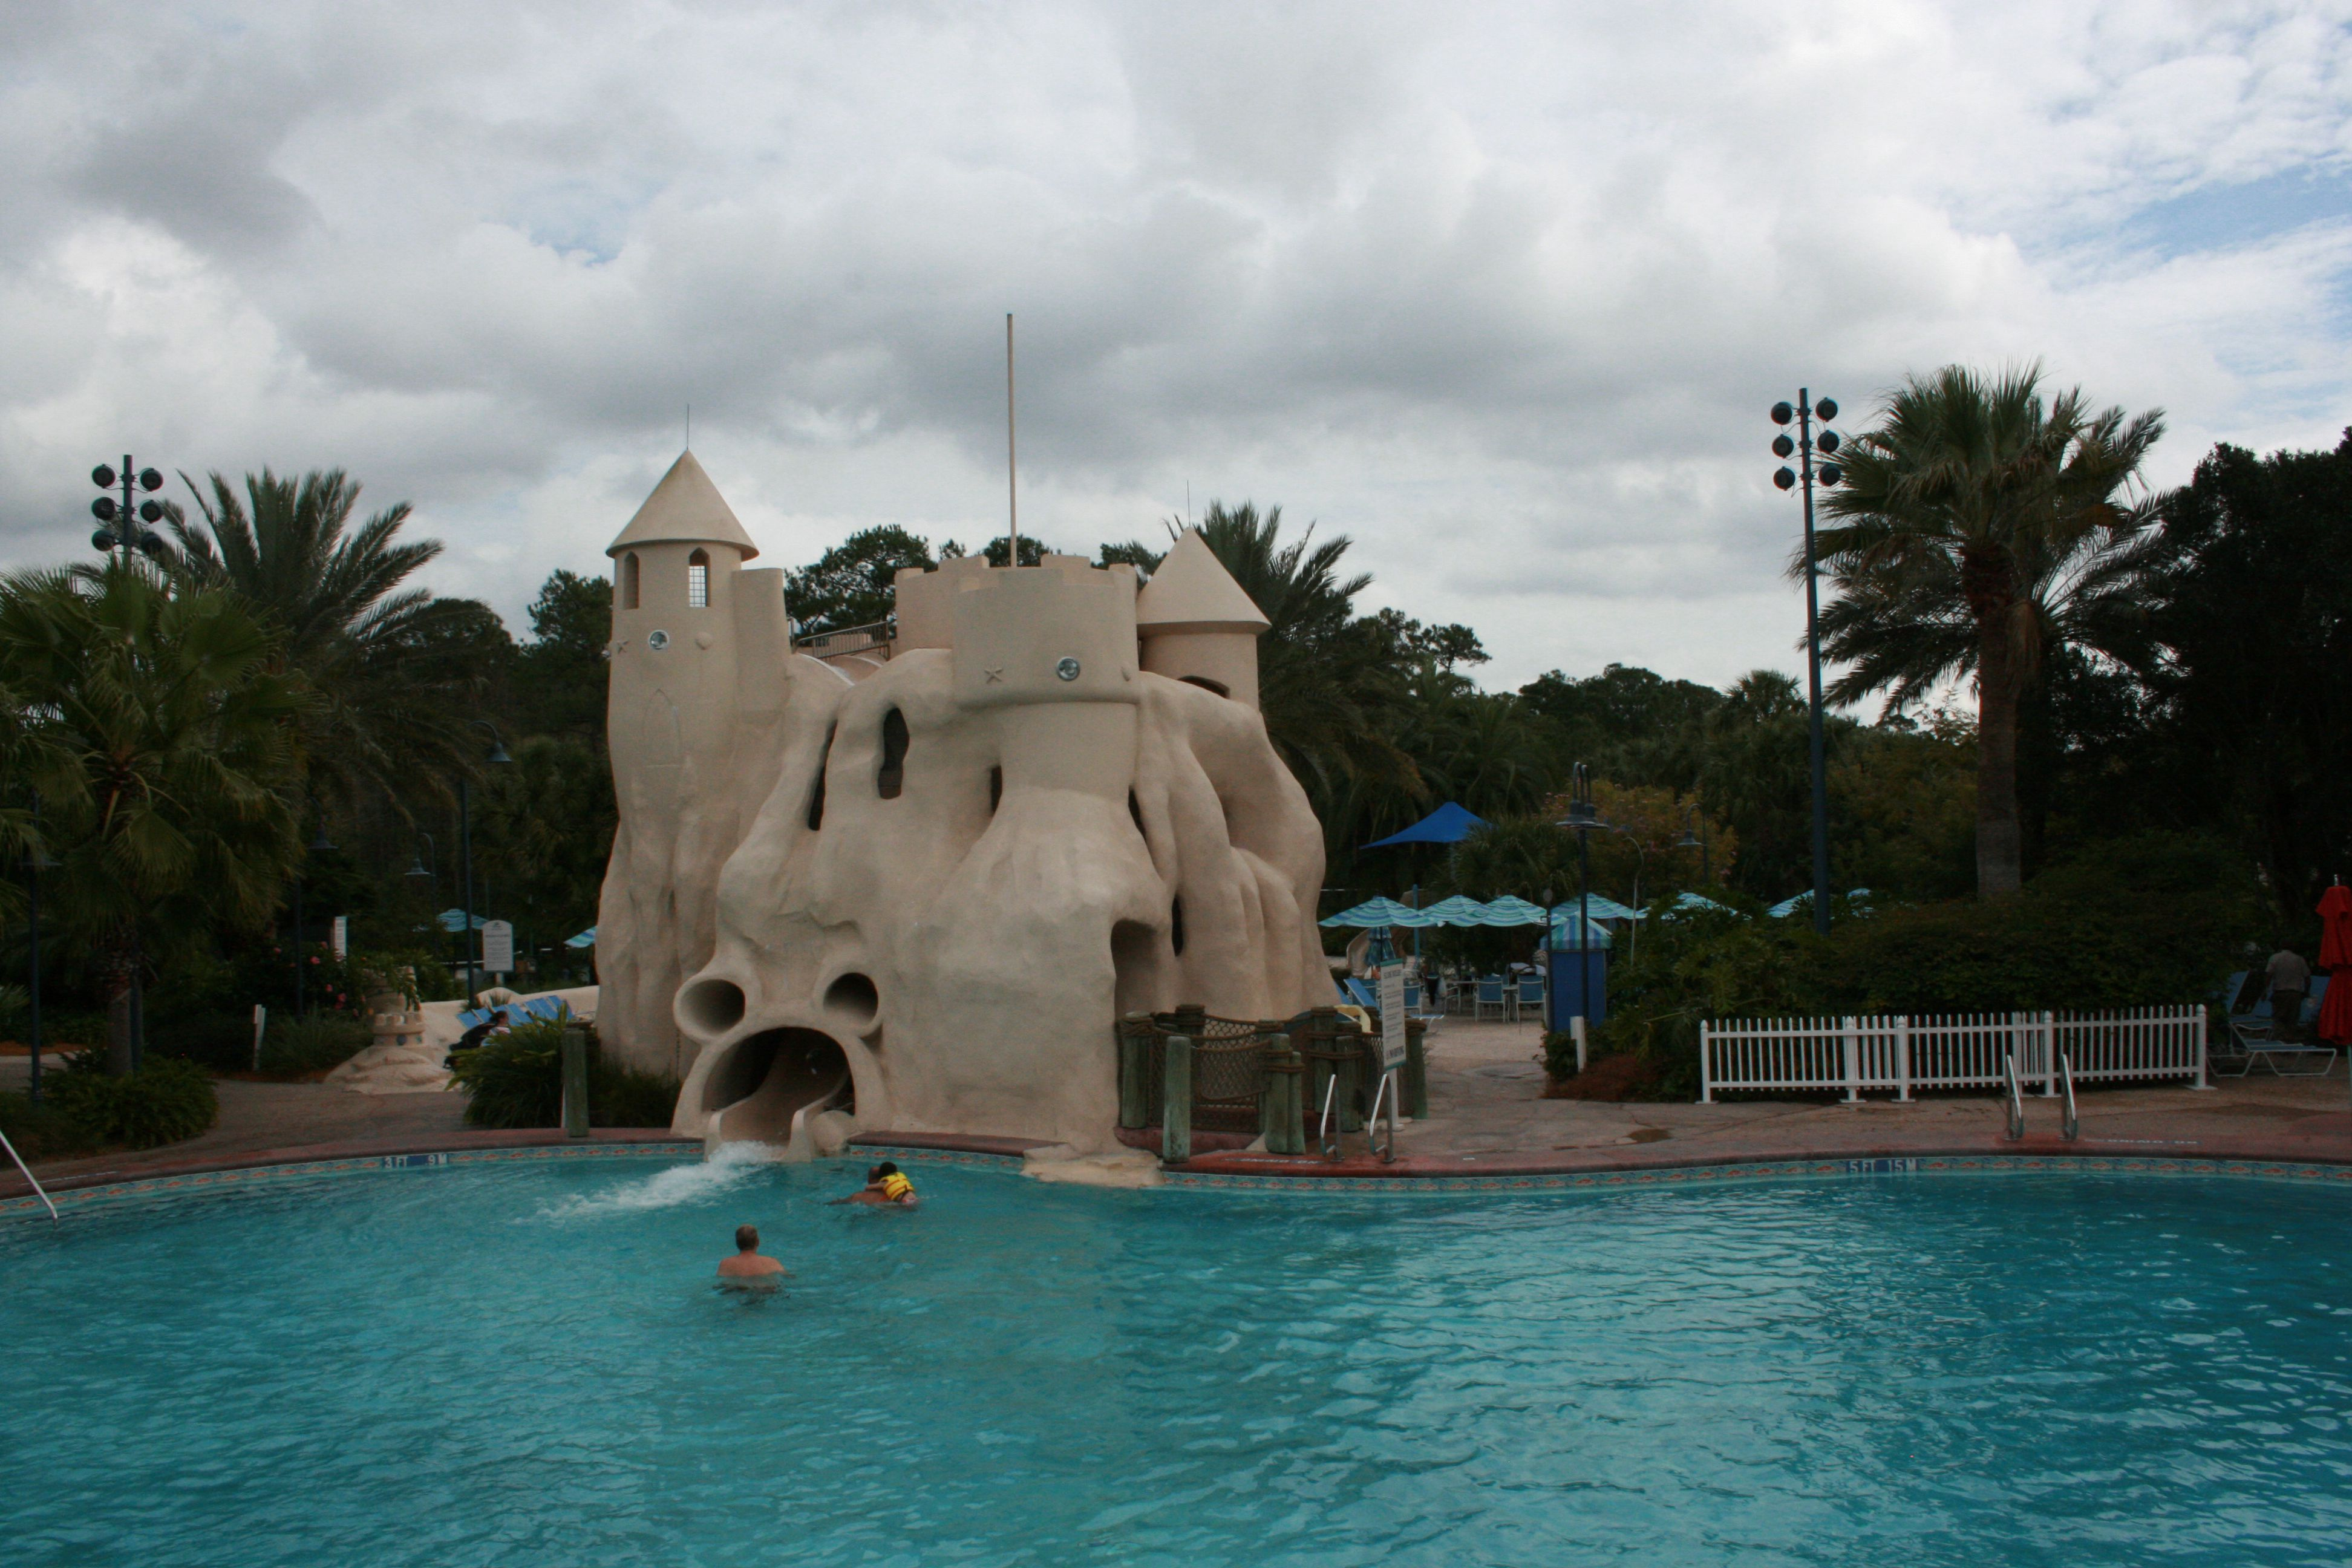 Water Slides at Walt Disney World Resorts